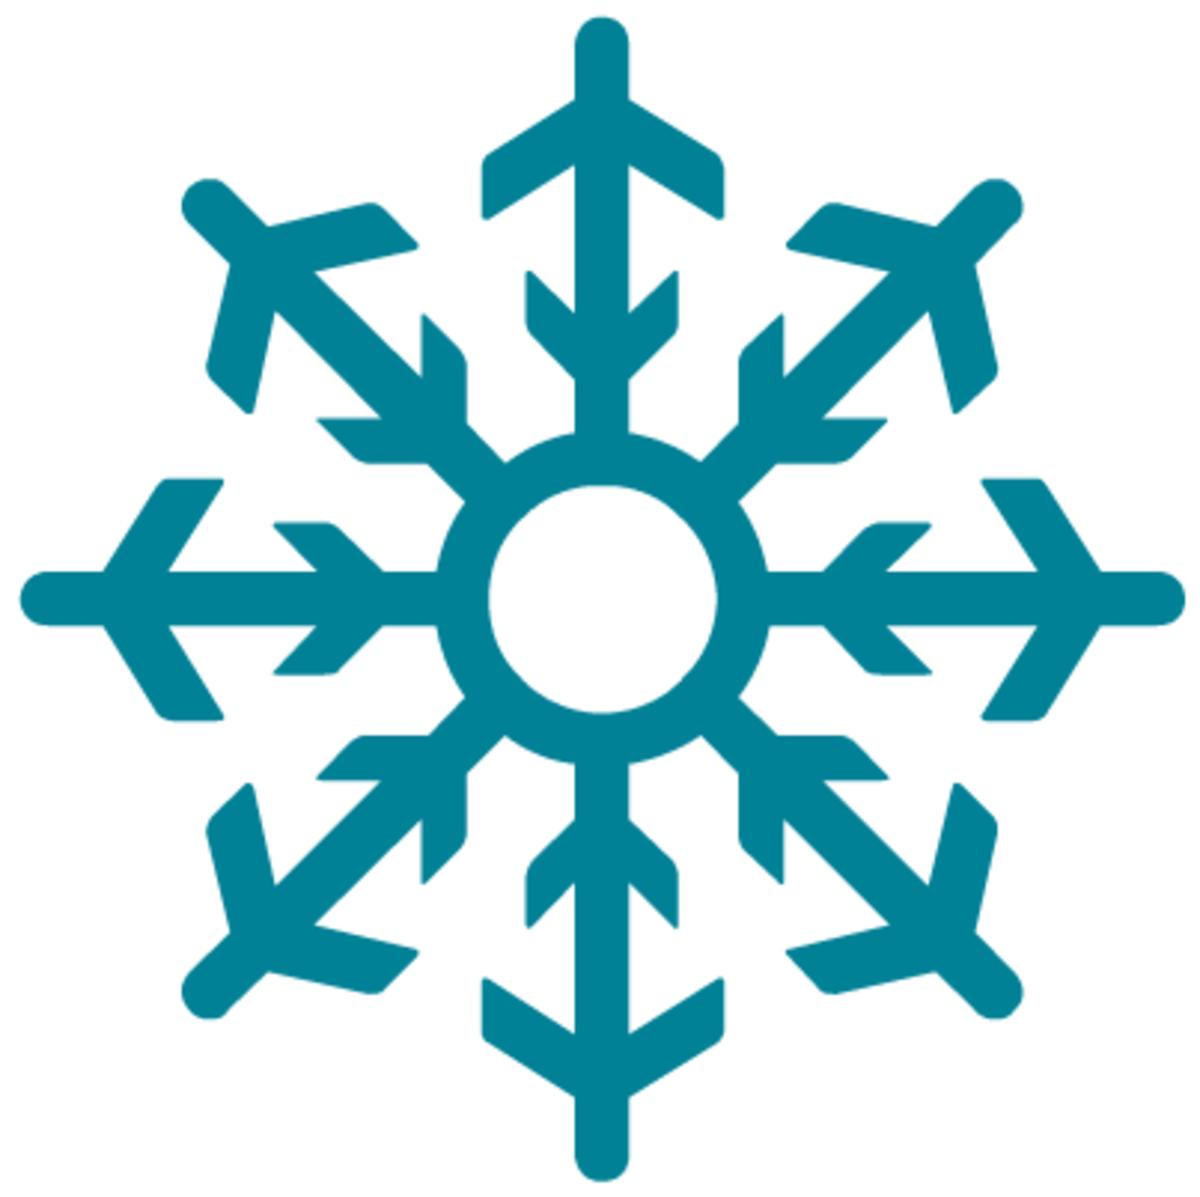 Winter snowflake clip art